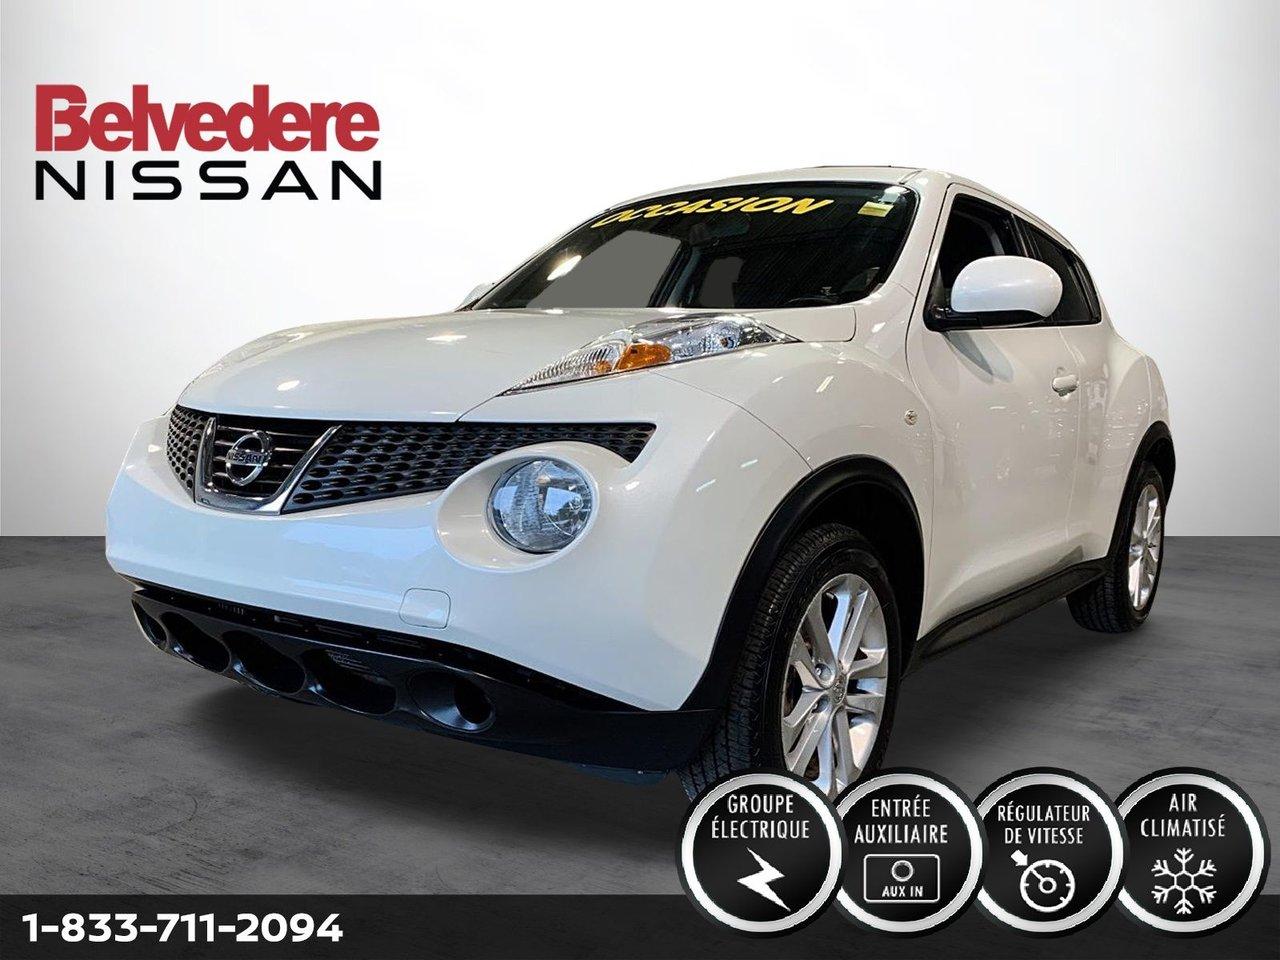 Nissan Juke 2014 SV AWD AUTOMATIQUE AIR CLIMATISÉ BLUETOOTH